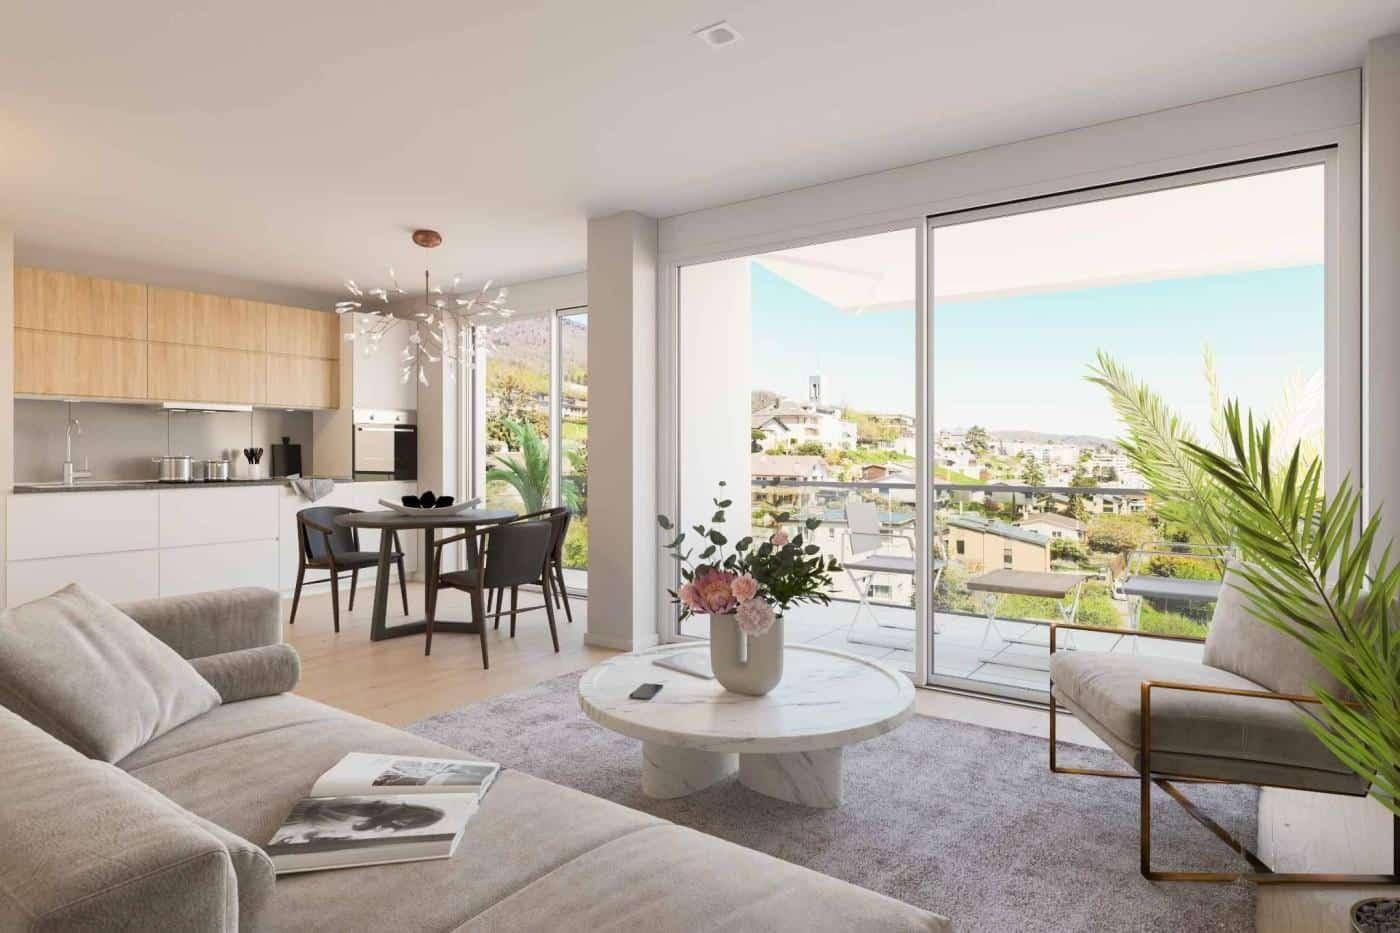 À vendre : Appartement 1 chambres Neuchâtel - Ref : 34709 | Naef Immobilier